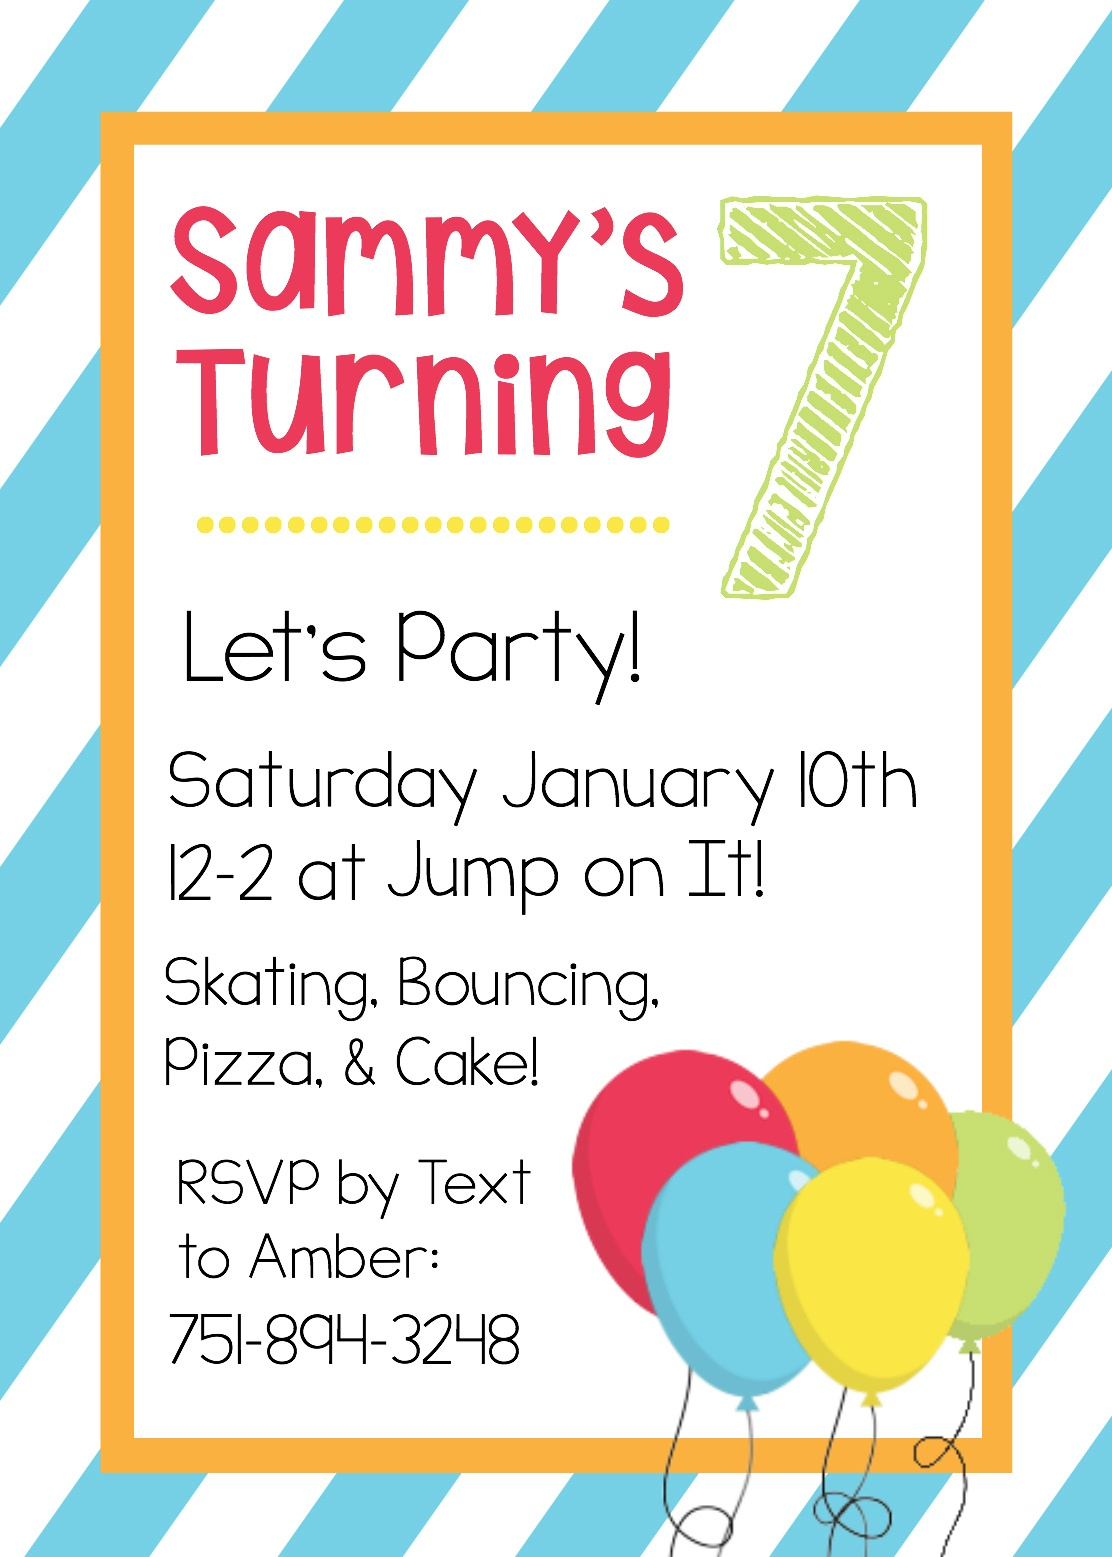 Free Printable Birthday Invitation Templates - Free Printable Birthday Invitations For Him